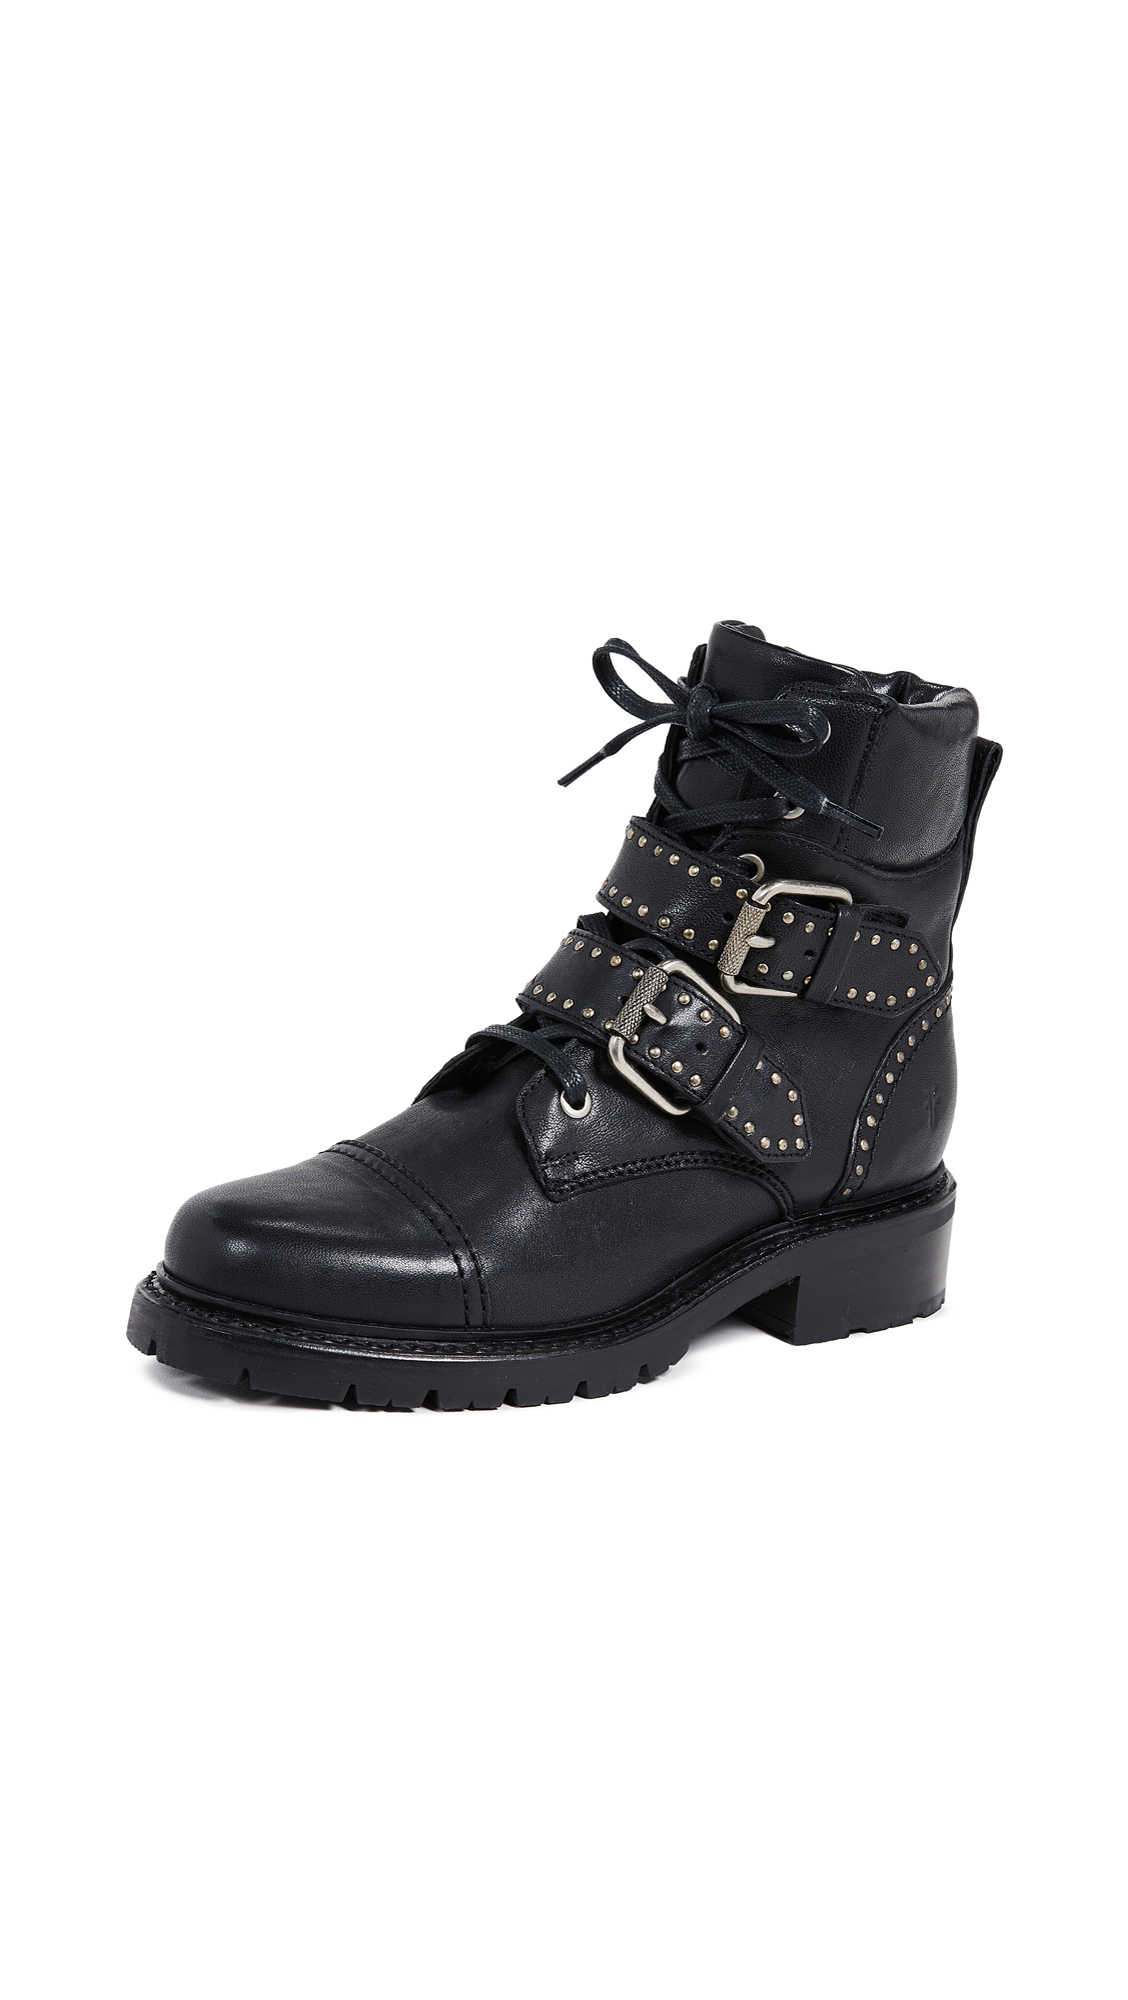 cf3e5026942 Frye Samantha Stud Belted Hiker Boots | Coshio Online Shop